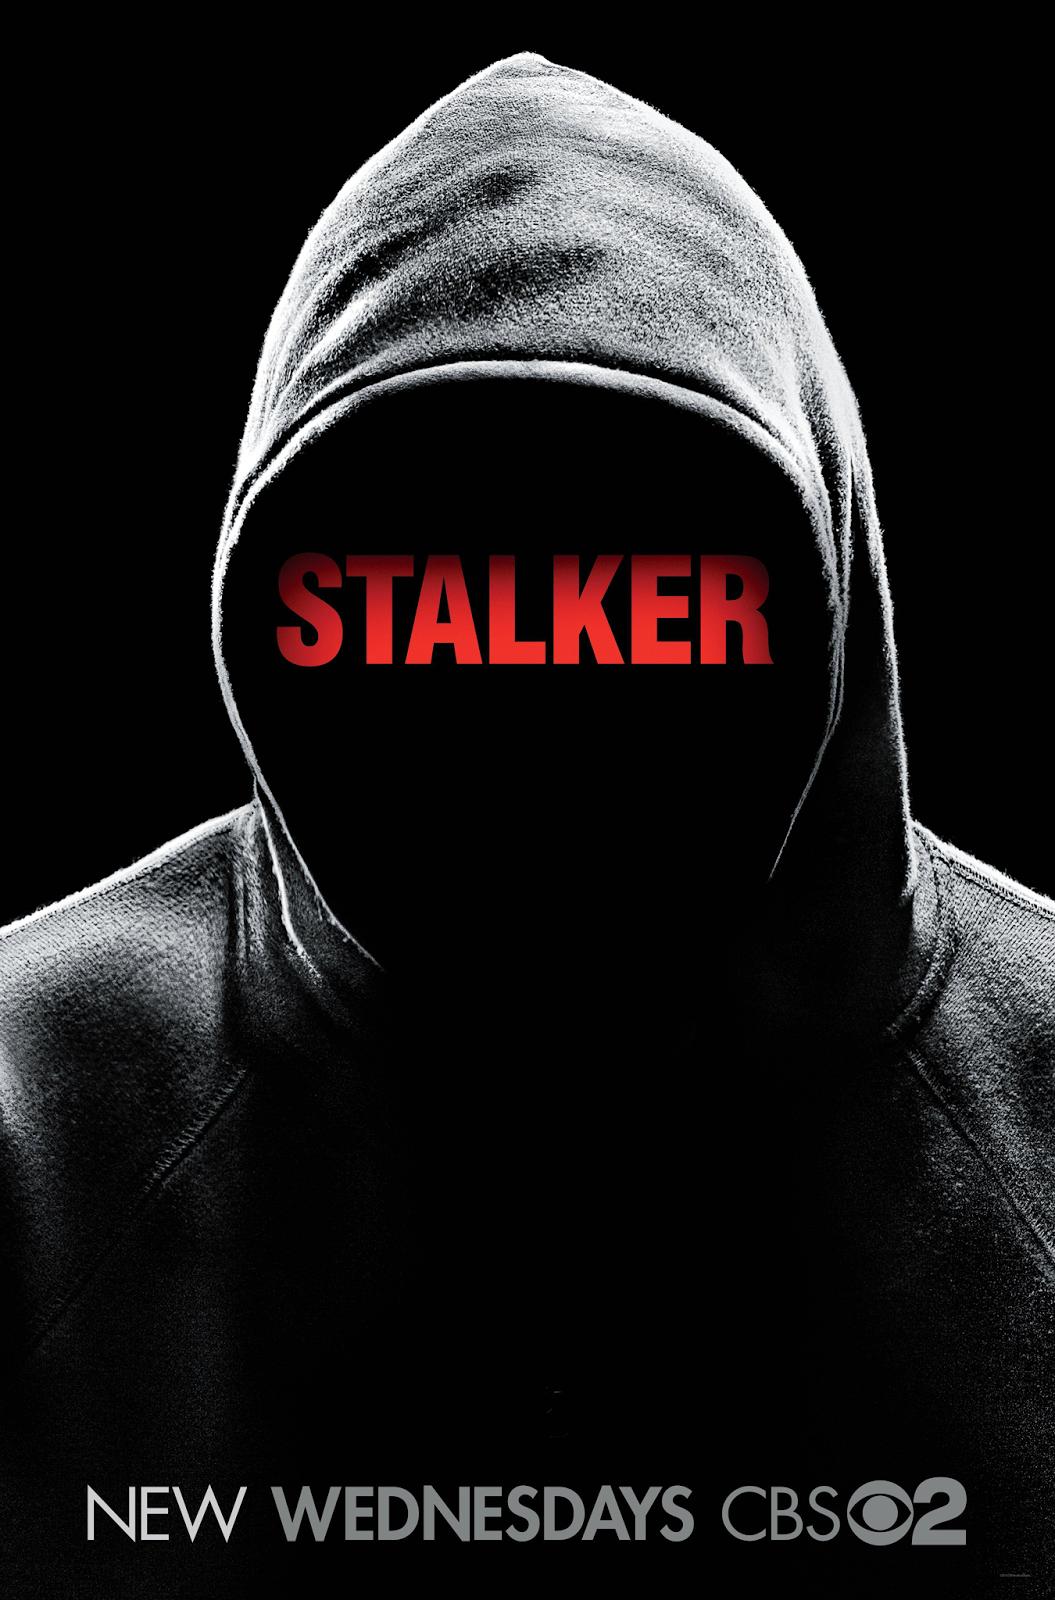 Download Stalker S01E04 HDTV AVI + RMVB Legendado Baixar Seriado